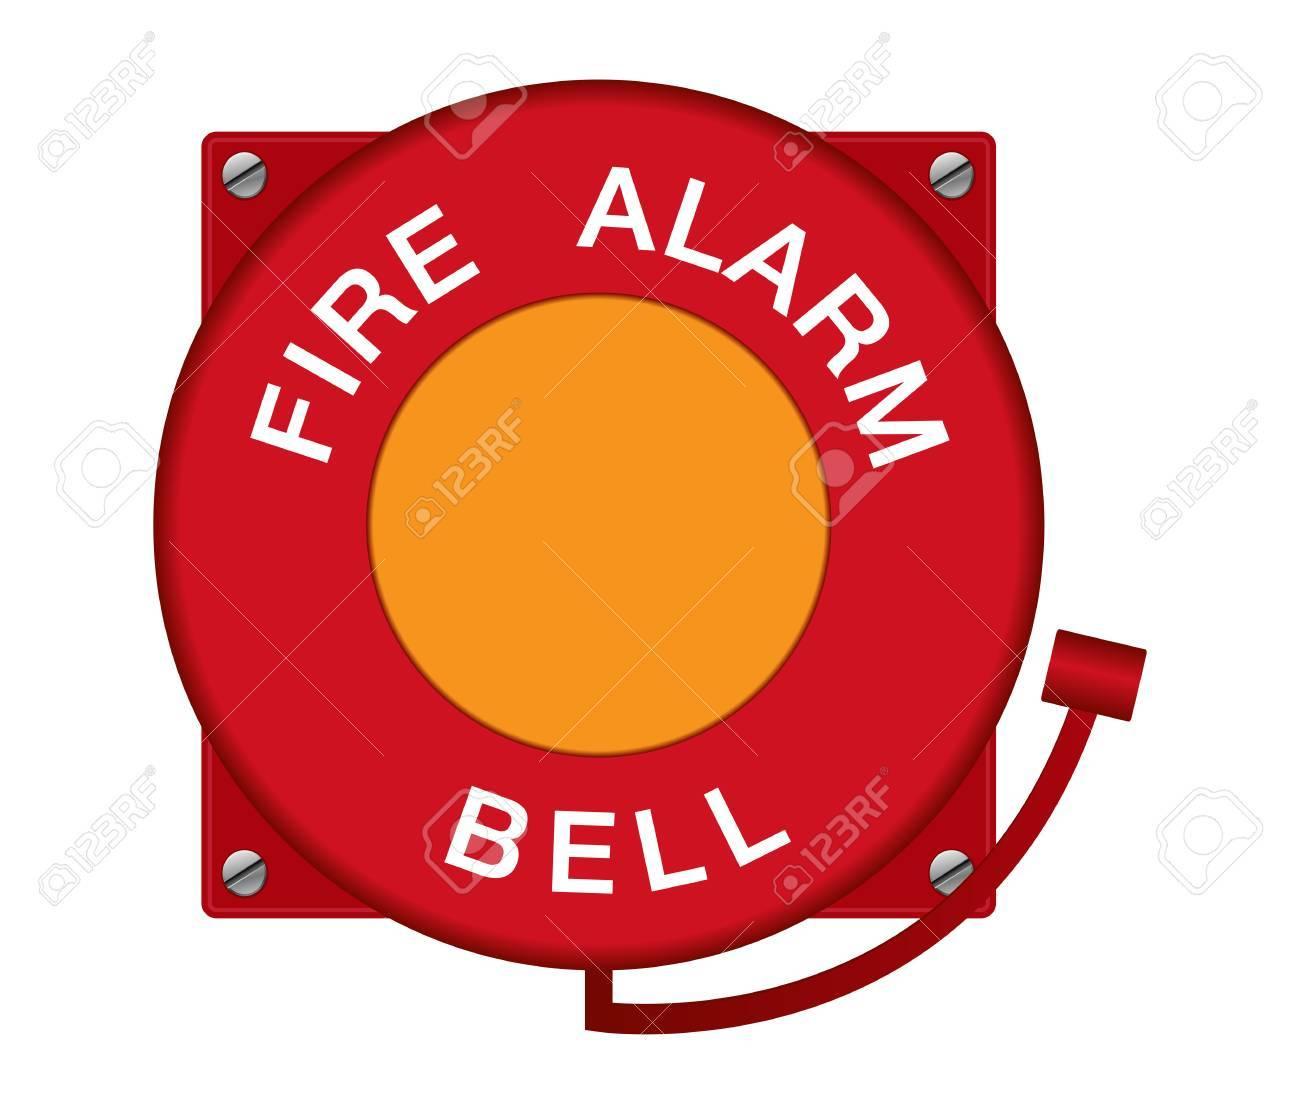 fire alarm bell royalty free cliparts vectors and stock rh 123rf com fire alarm clip art images fire alarm clip art images